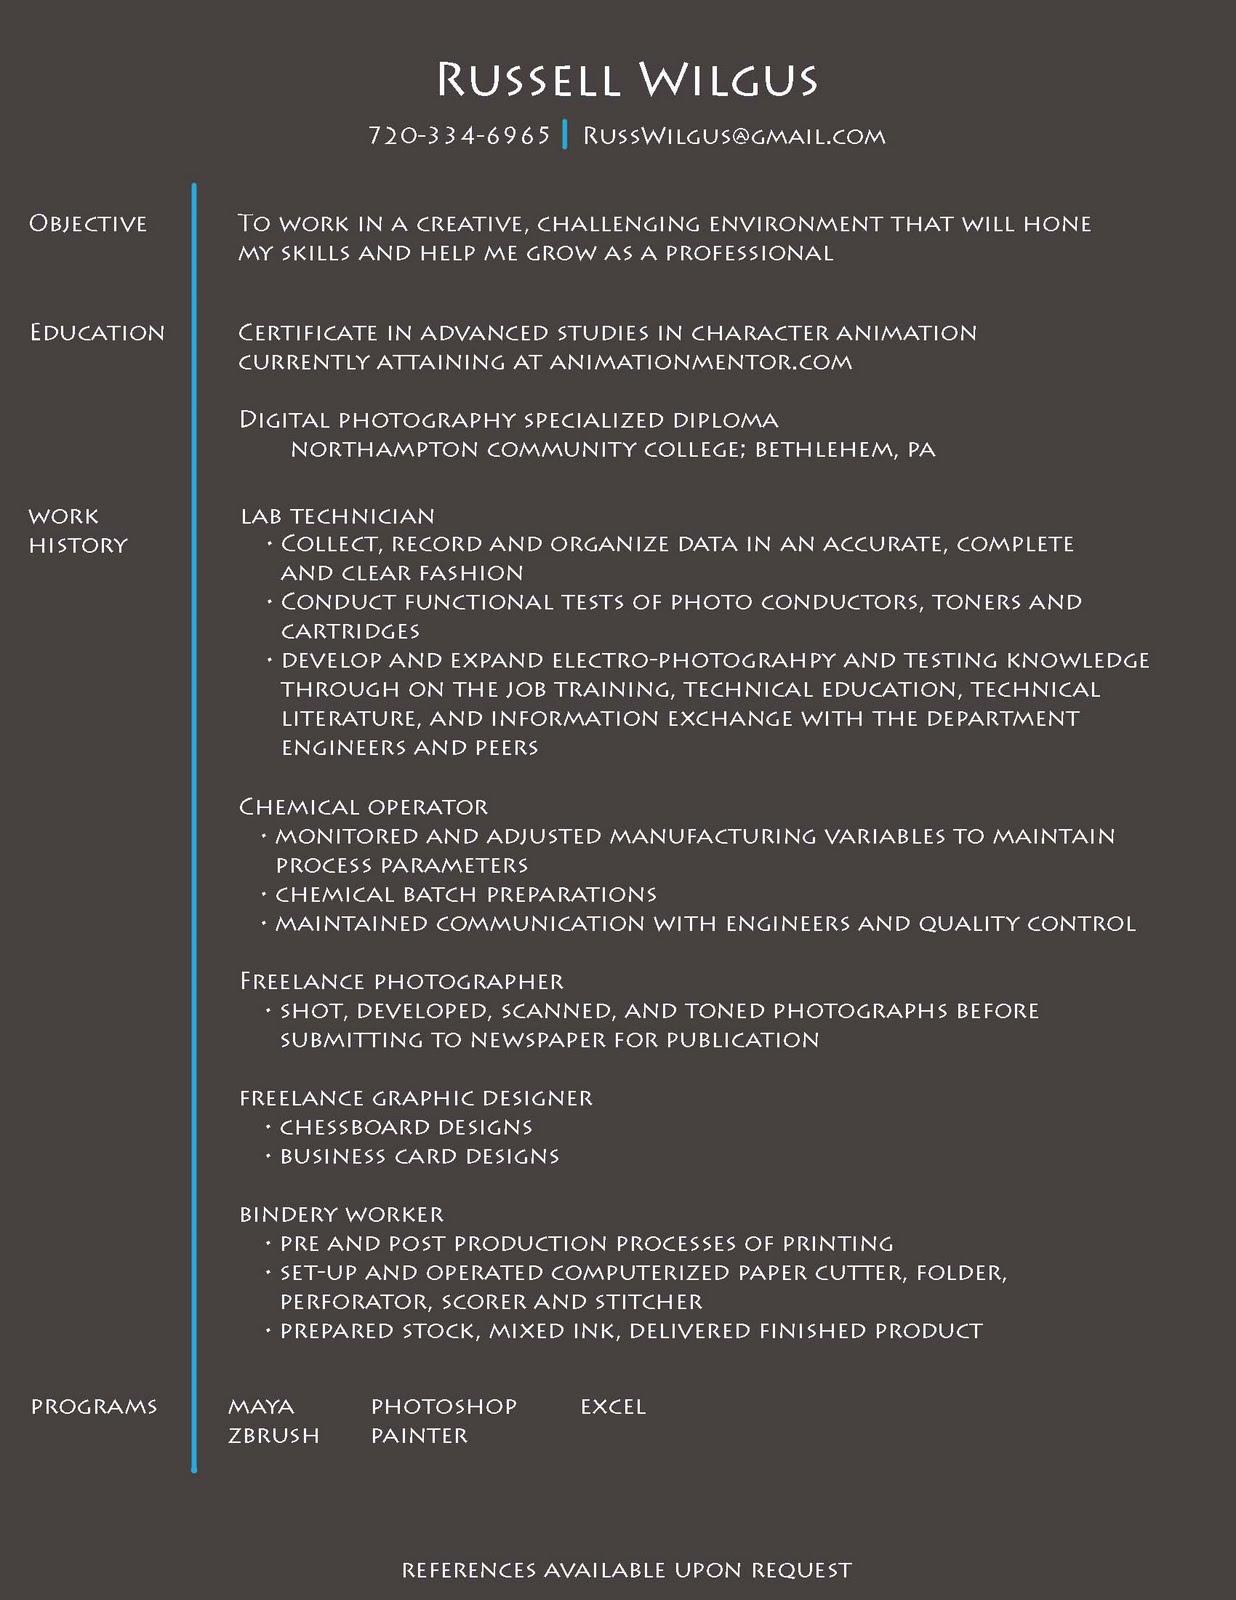 Bindery Helper Resume Documents Executive Resume Writers Hr Executive  Summary HR Executive Resume CEO Resum Executive